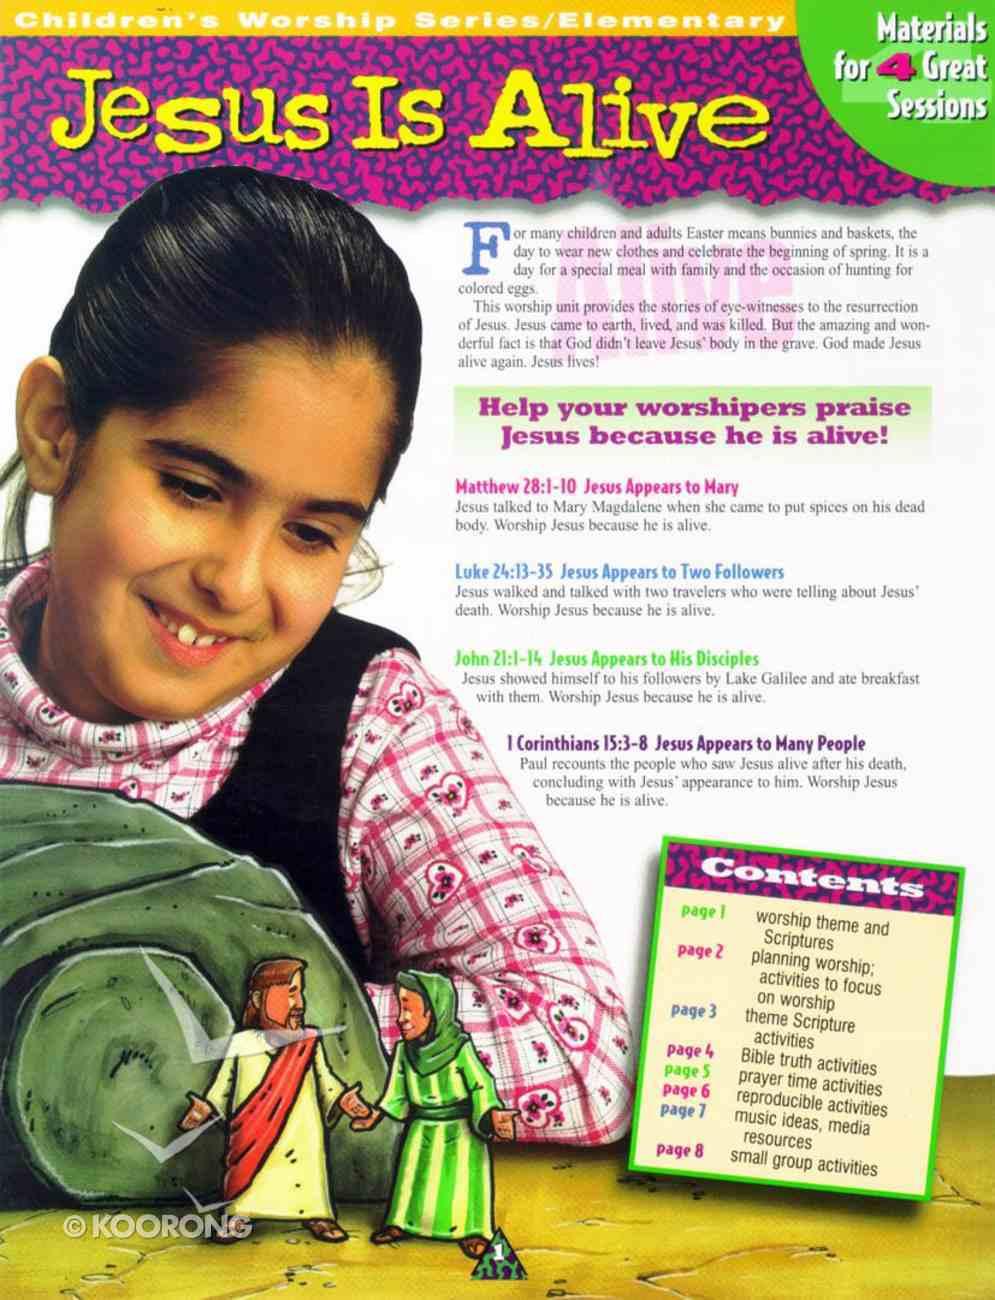 Children's Worship Folder: Jesus is Alive Paperback